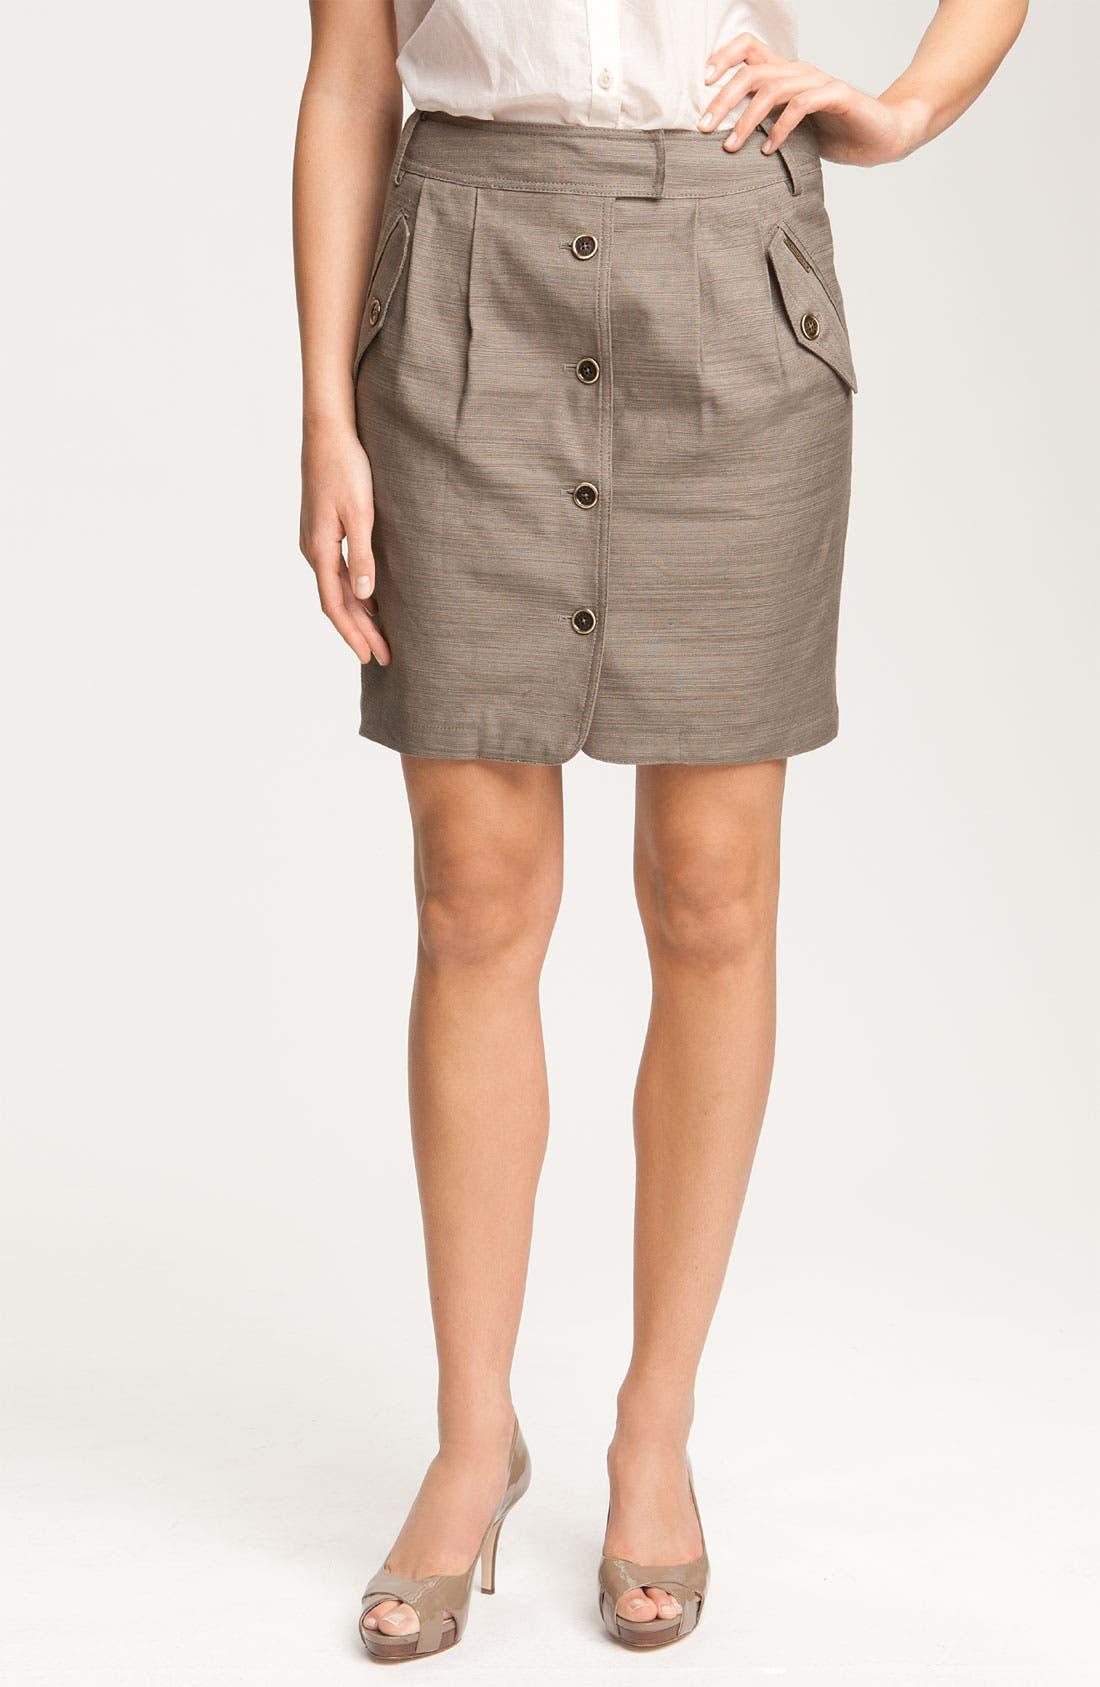 Alternate Image 1 Selected - Anne Klein Button Front Slub Weave Skirt